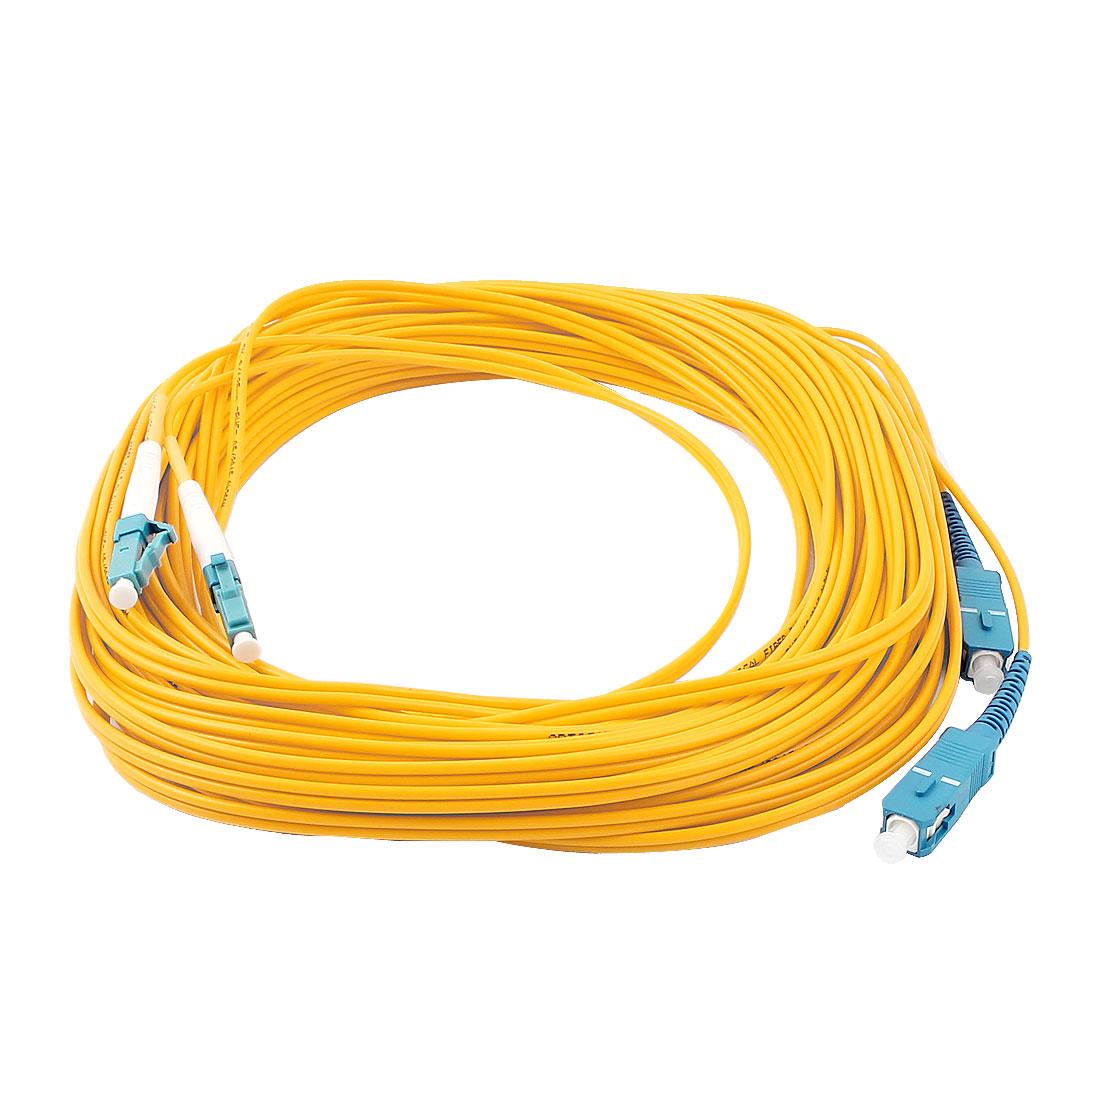 15M 49Ft Jumper Cable Duplex Singlemode SC-LC Fiber Optic Patch Cord